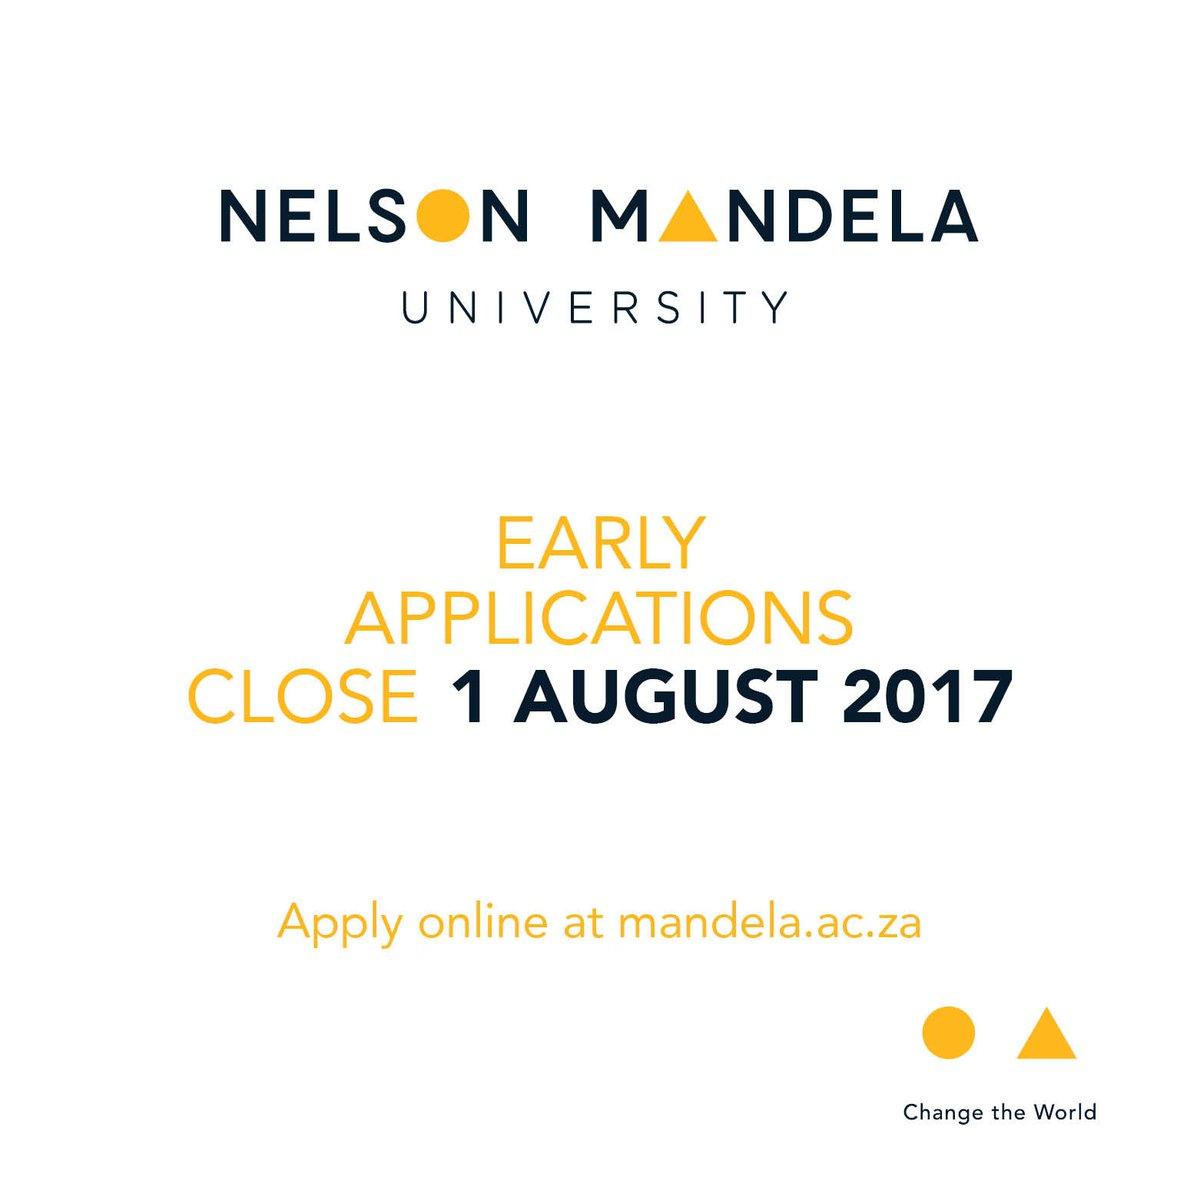 ApplyNow@NelsonMandelaUniversity #apply #application #1Aug #deadline #university #Education<br>http://pic.twitter.com/c1zDNIvQDn